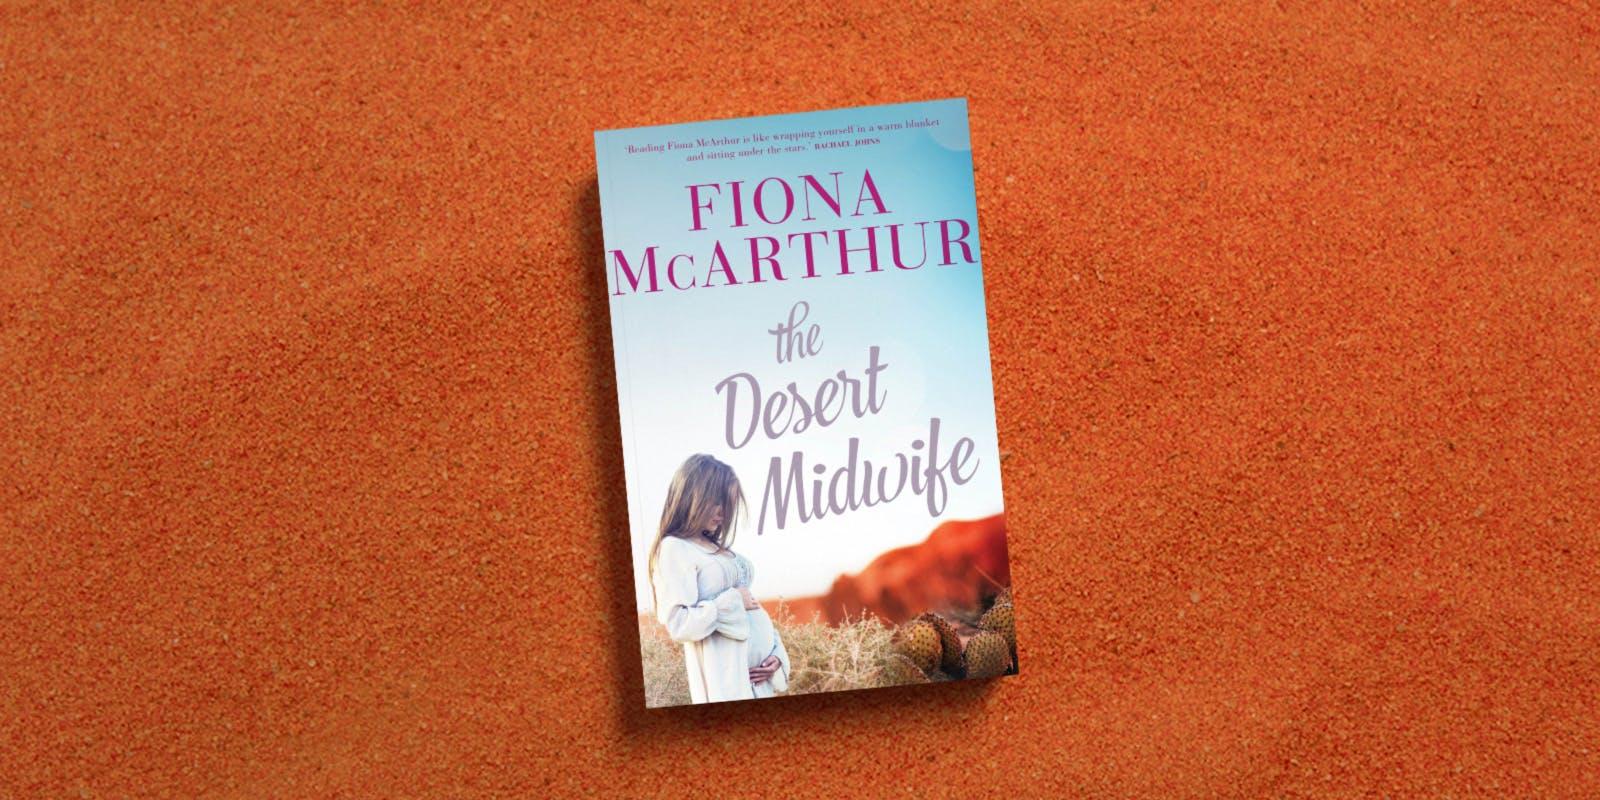 Fiona McArthur Q&A